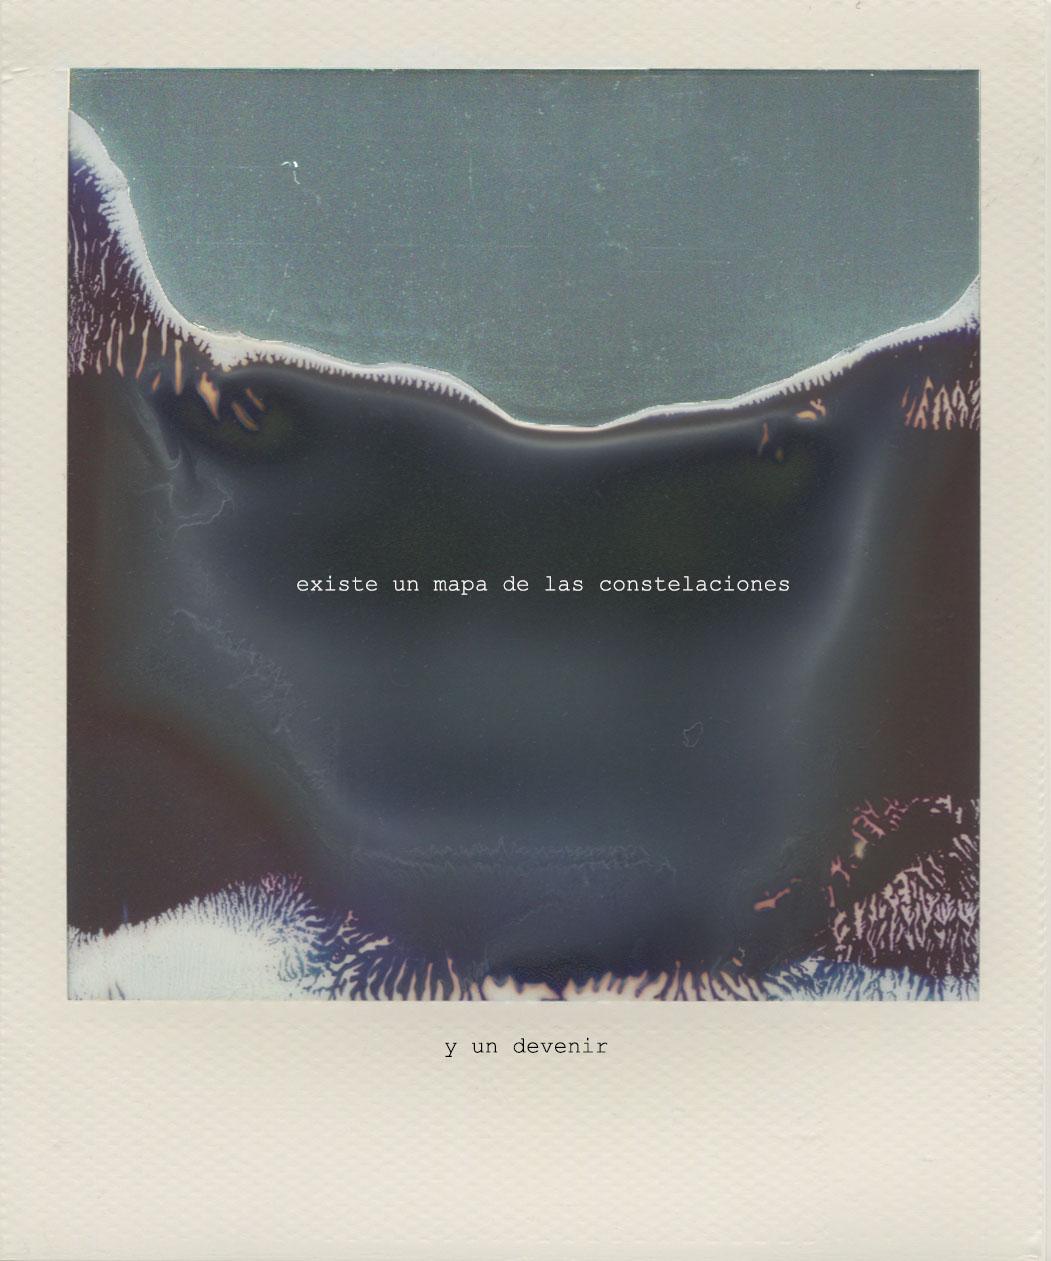 Constelaciones1-NataliaRomay.jpg